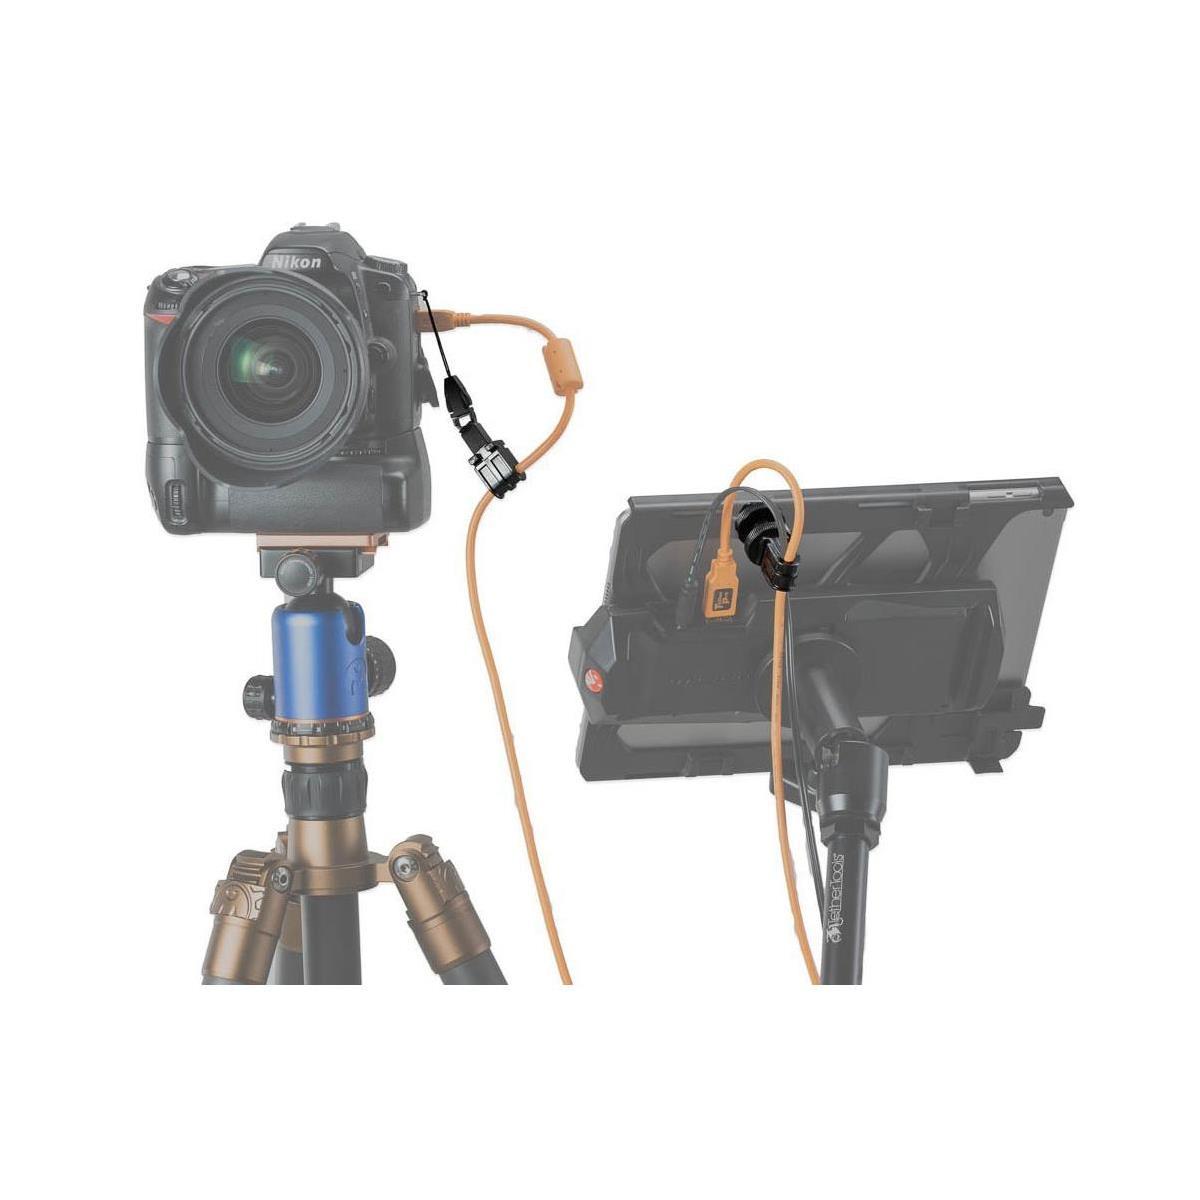 Tether Tools JerkStopper Digital Director Kit